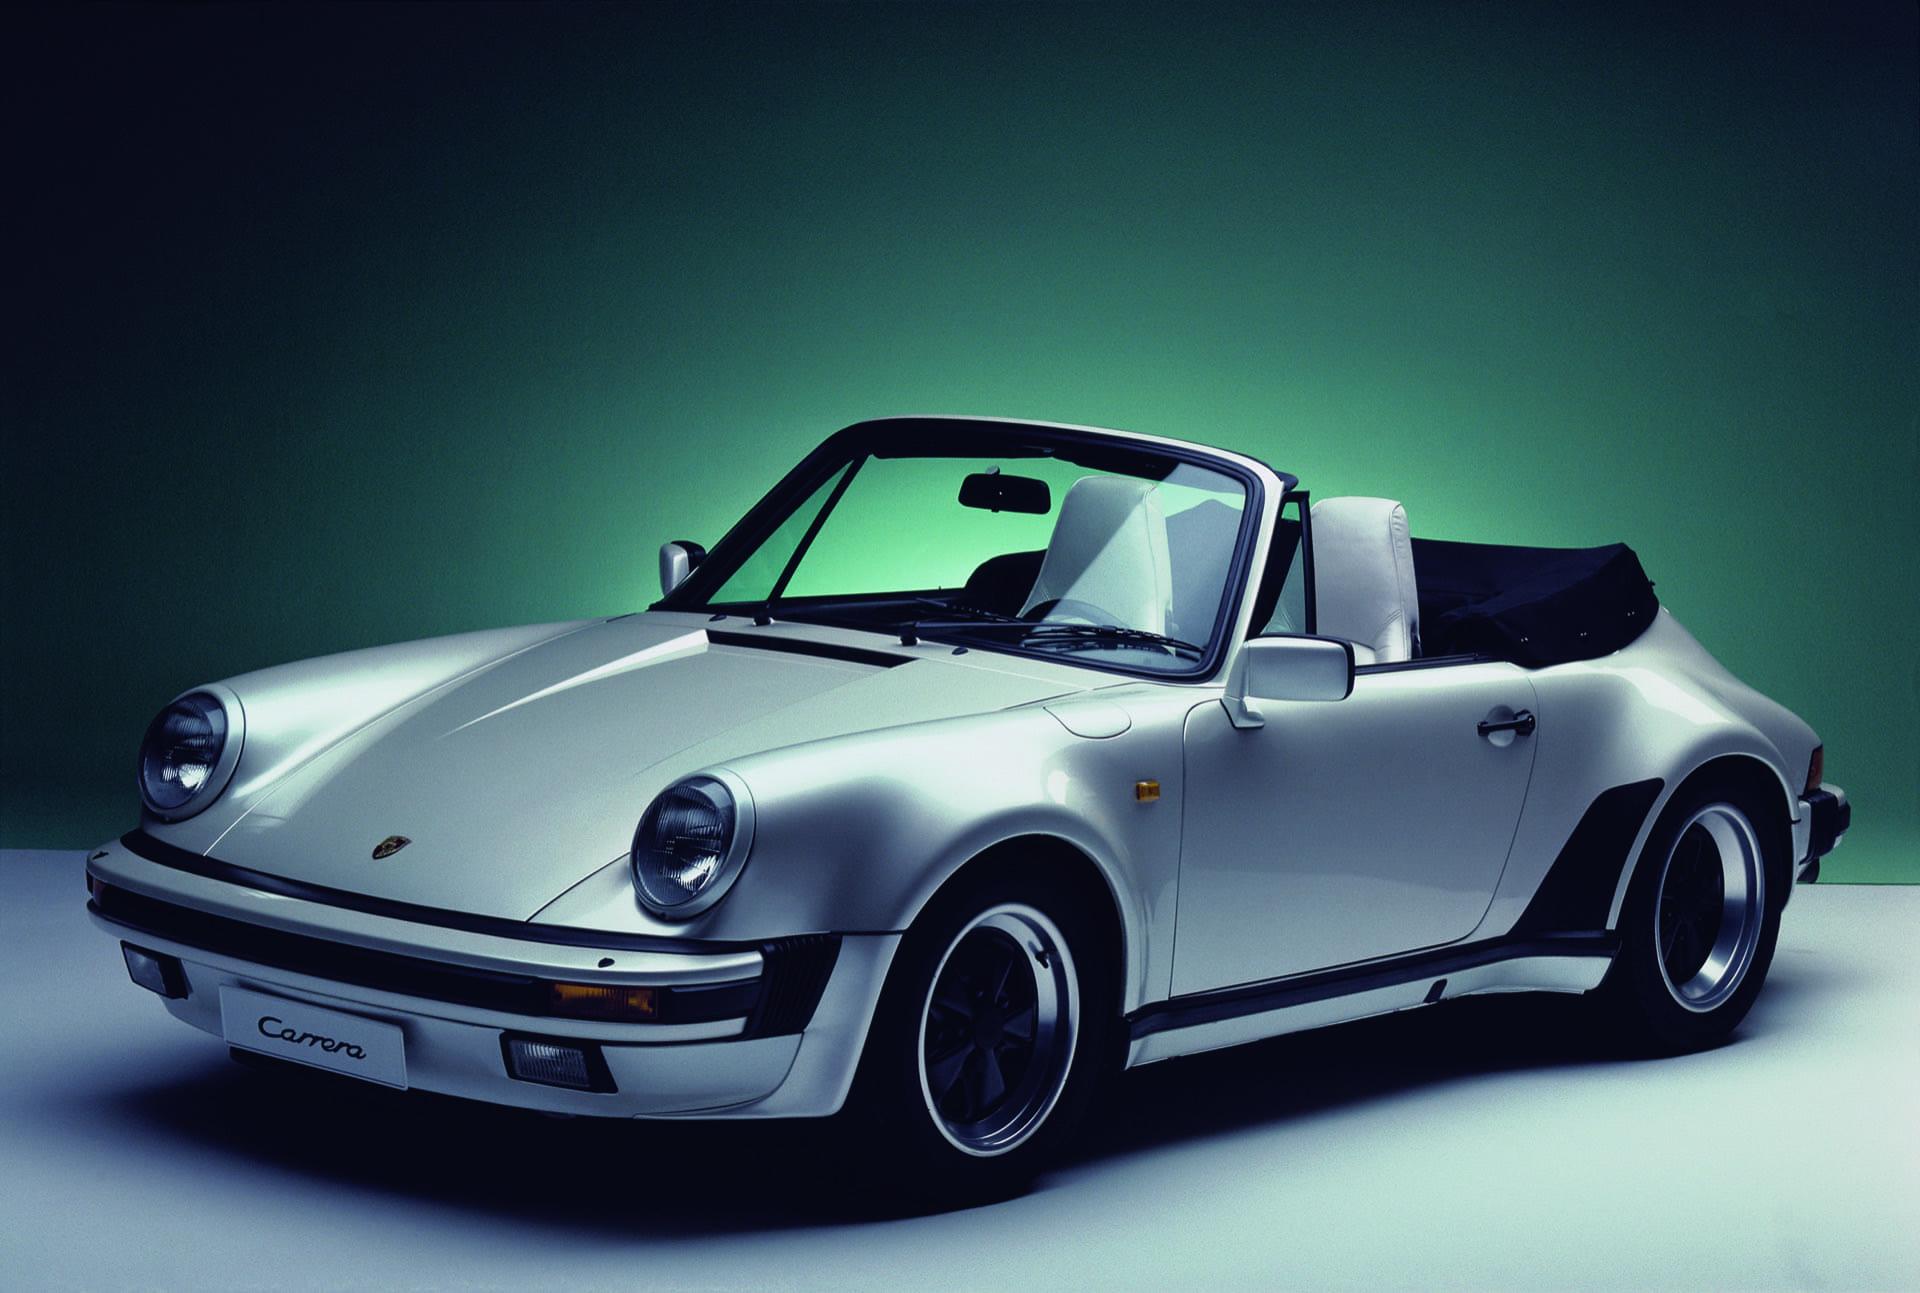 Porsche 911 G Carrera 3 2 Cabrio 1985